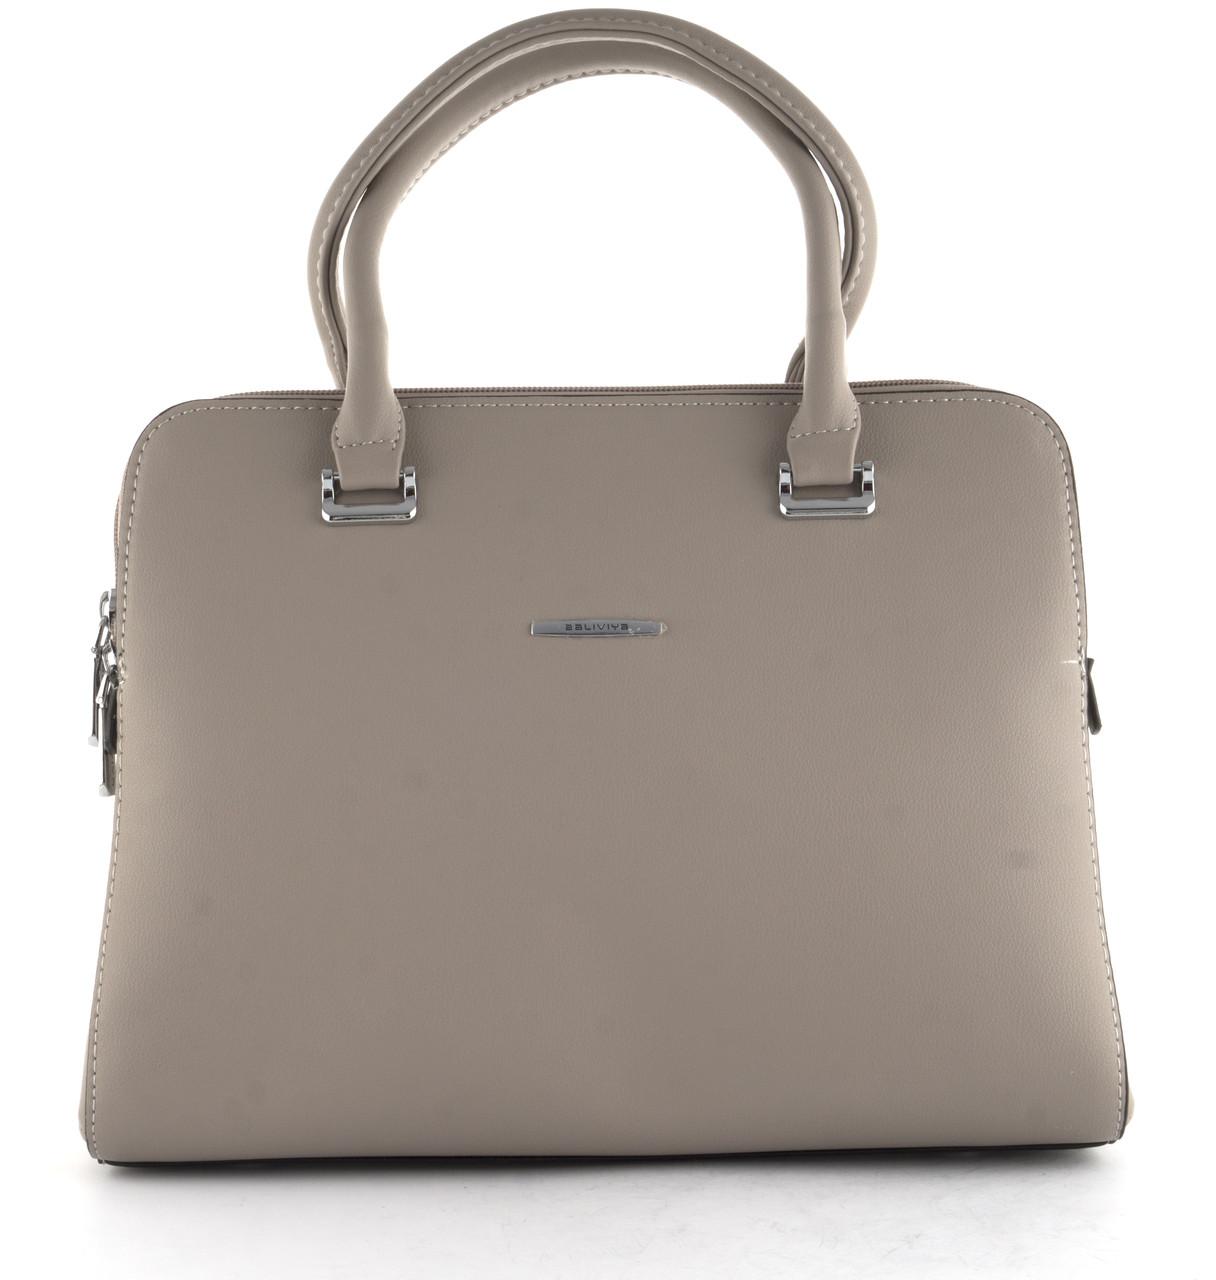 Удобная надежная стильная прочная женская сумка BALIVIYA art. 7703